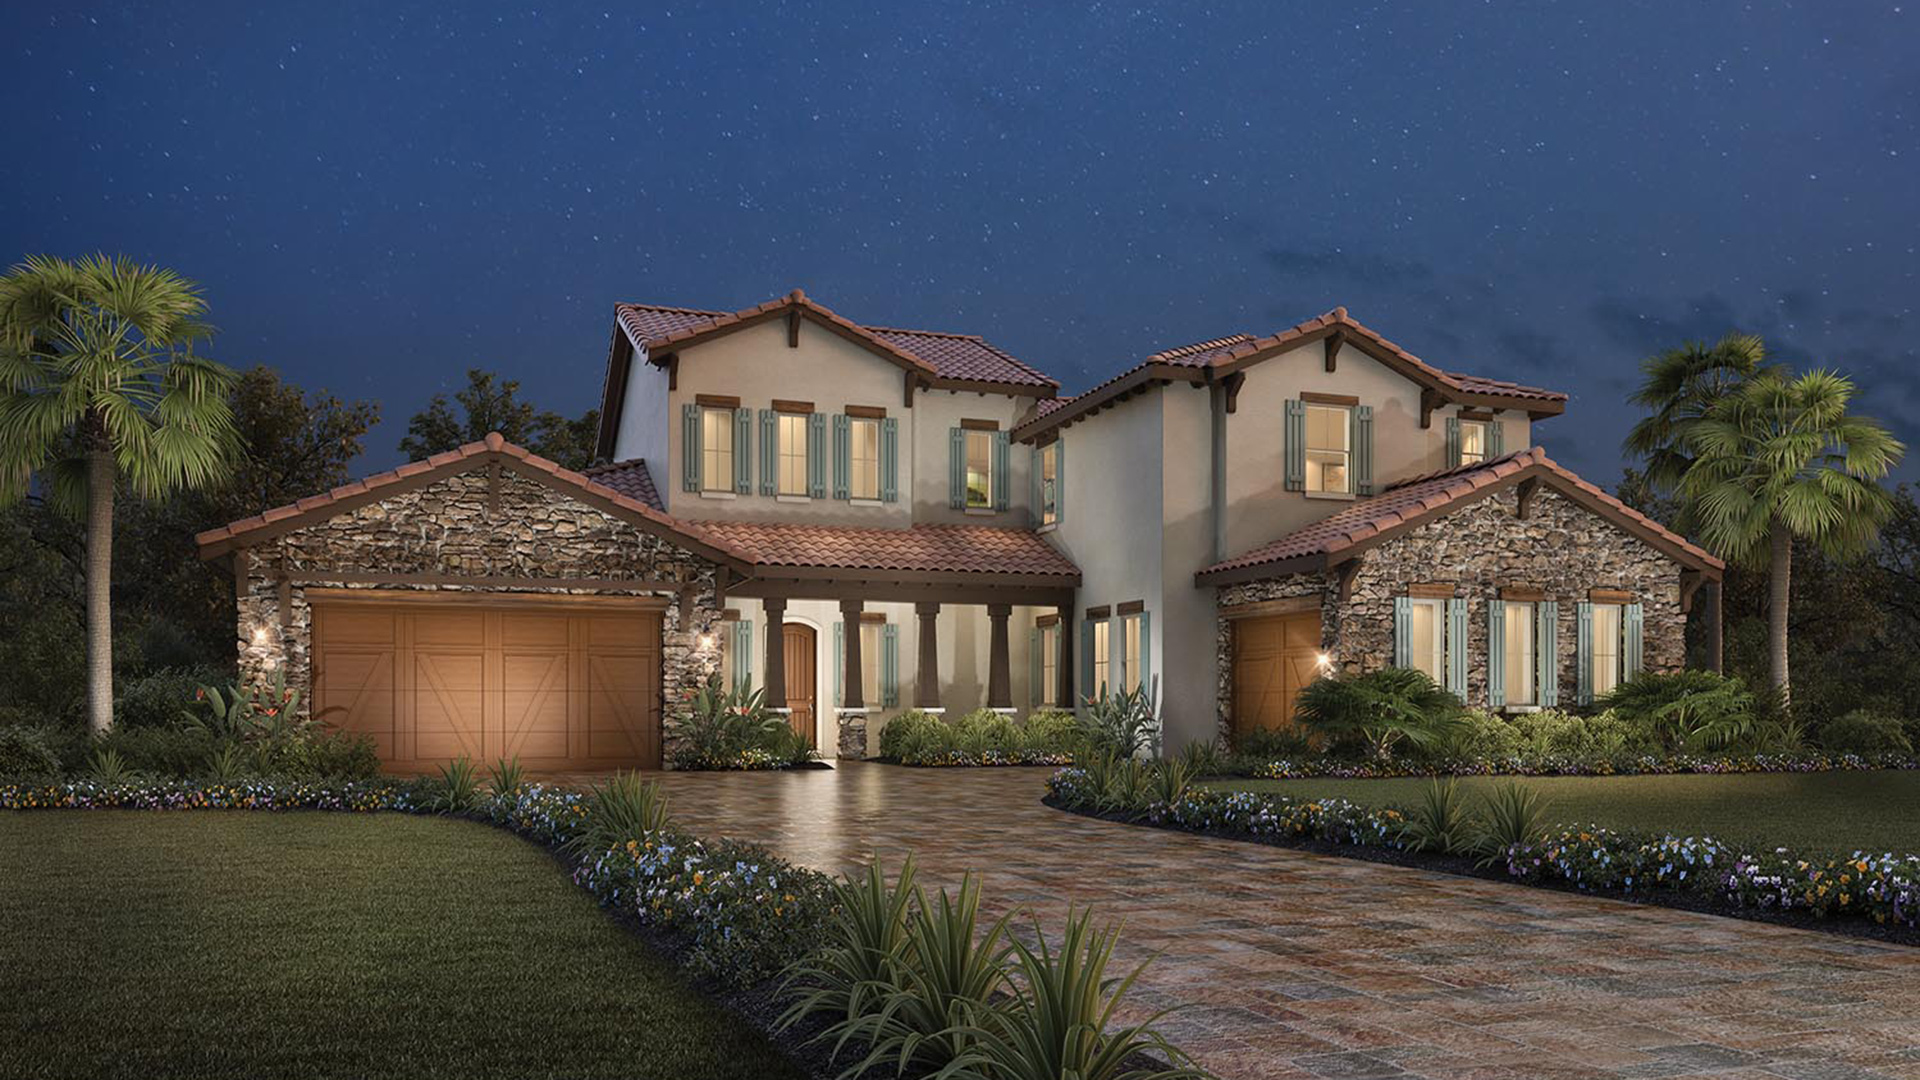 Lakeshore estates collection the santa bella home design for Lakeshore design builders